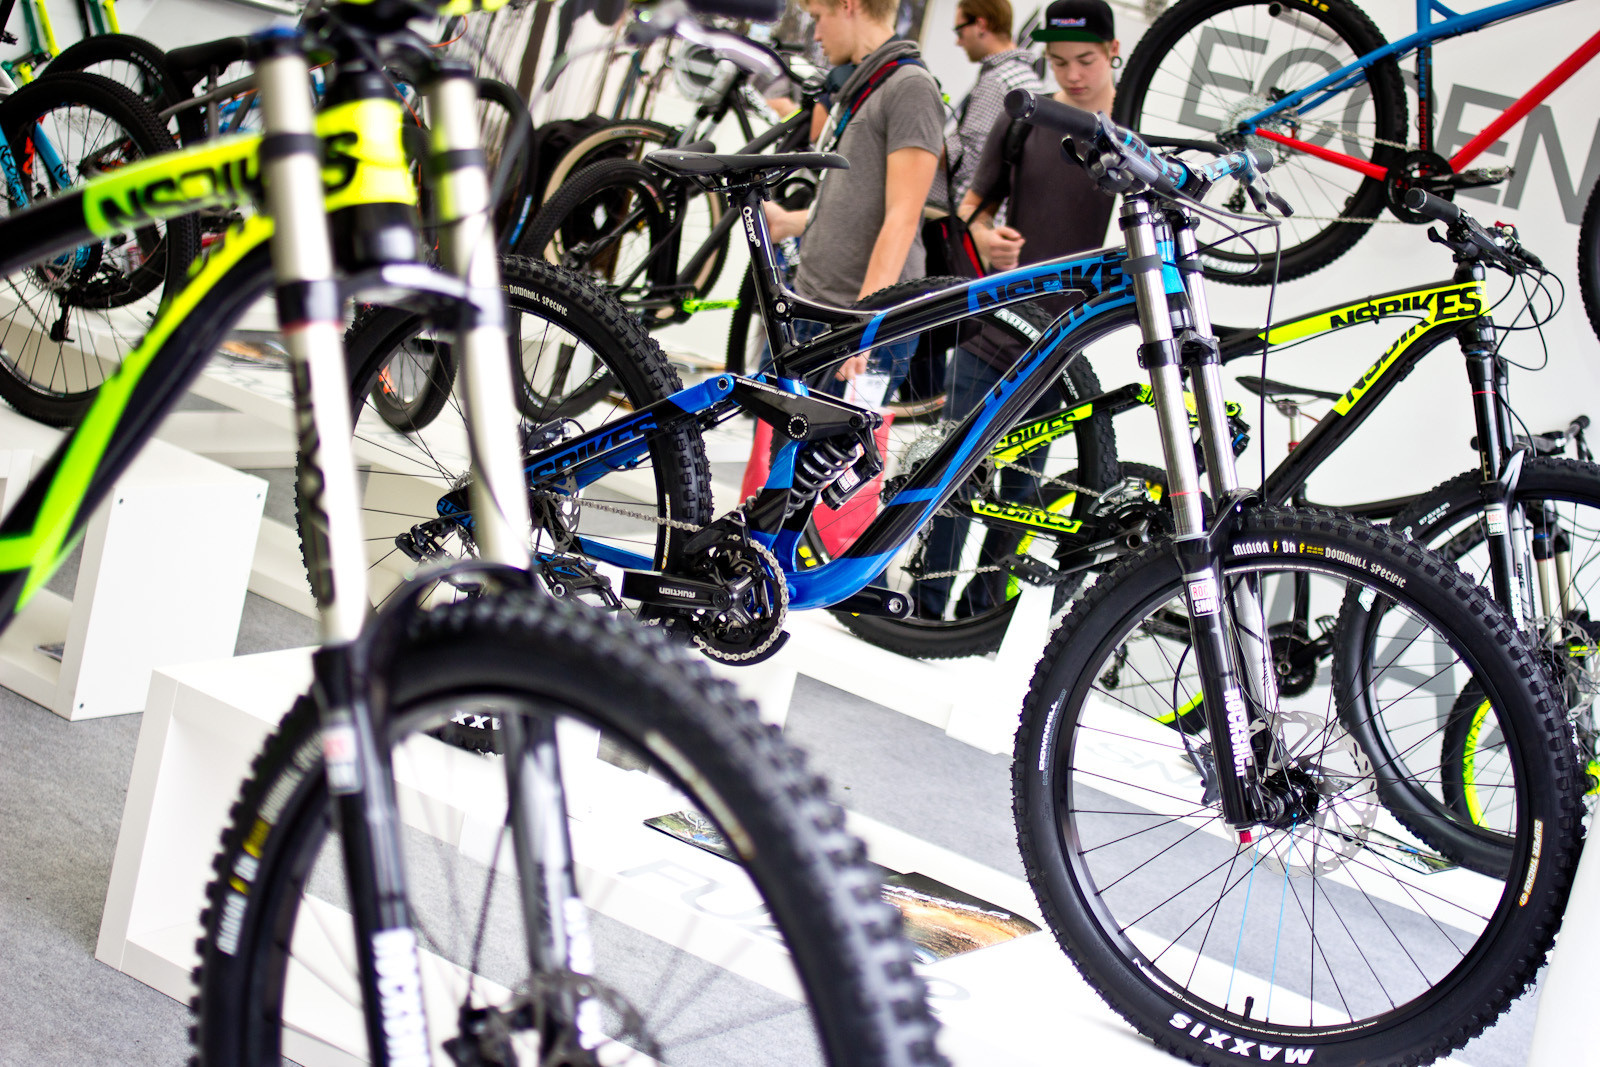 2014 NS Fuzz DH Bike - 2014 Downhill Bikes at Eurobike 2013 - Mountain Biking Pictures - Vital MTB